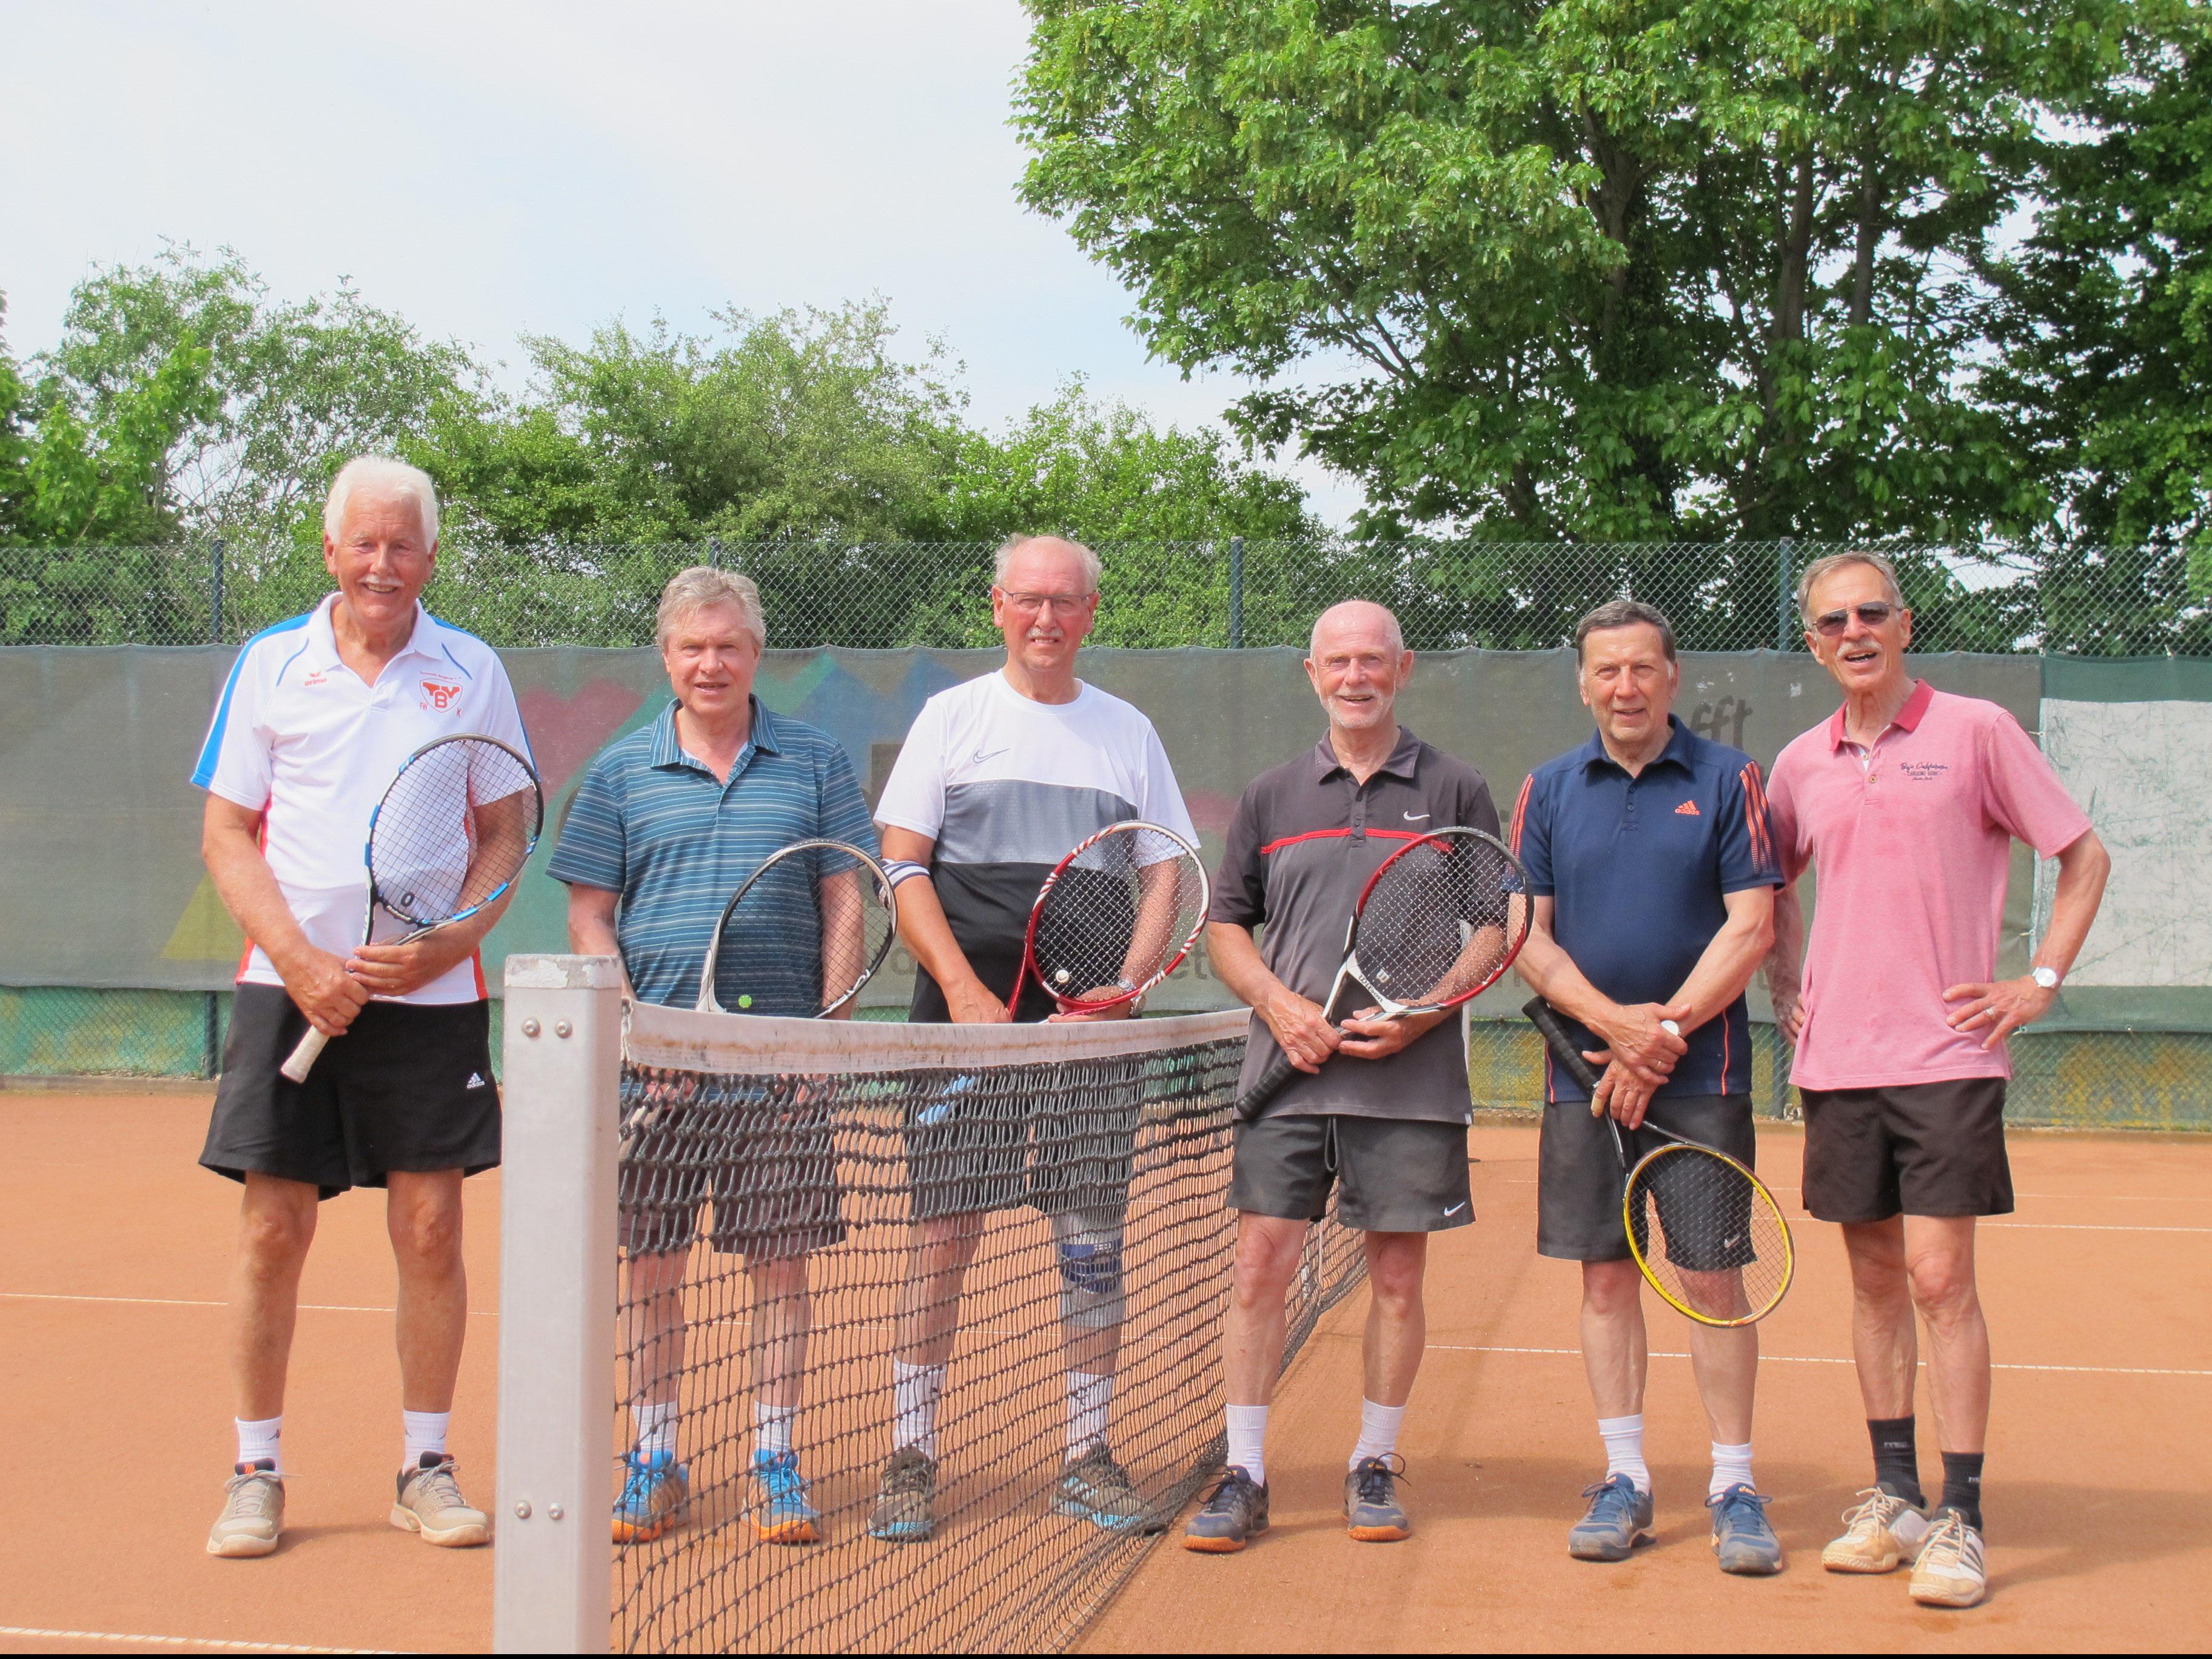 Bernd Schade, Manfred Stock,Reinhard Zindel, Horst Bauermeister, Jürgen Otto, Peter Riediger. Nicht im Bild: Stephan Beck